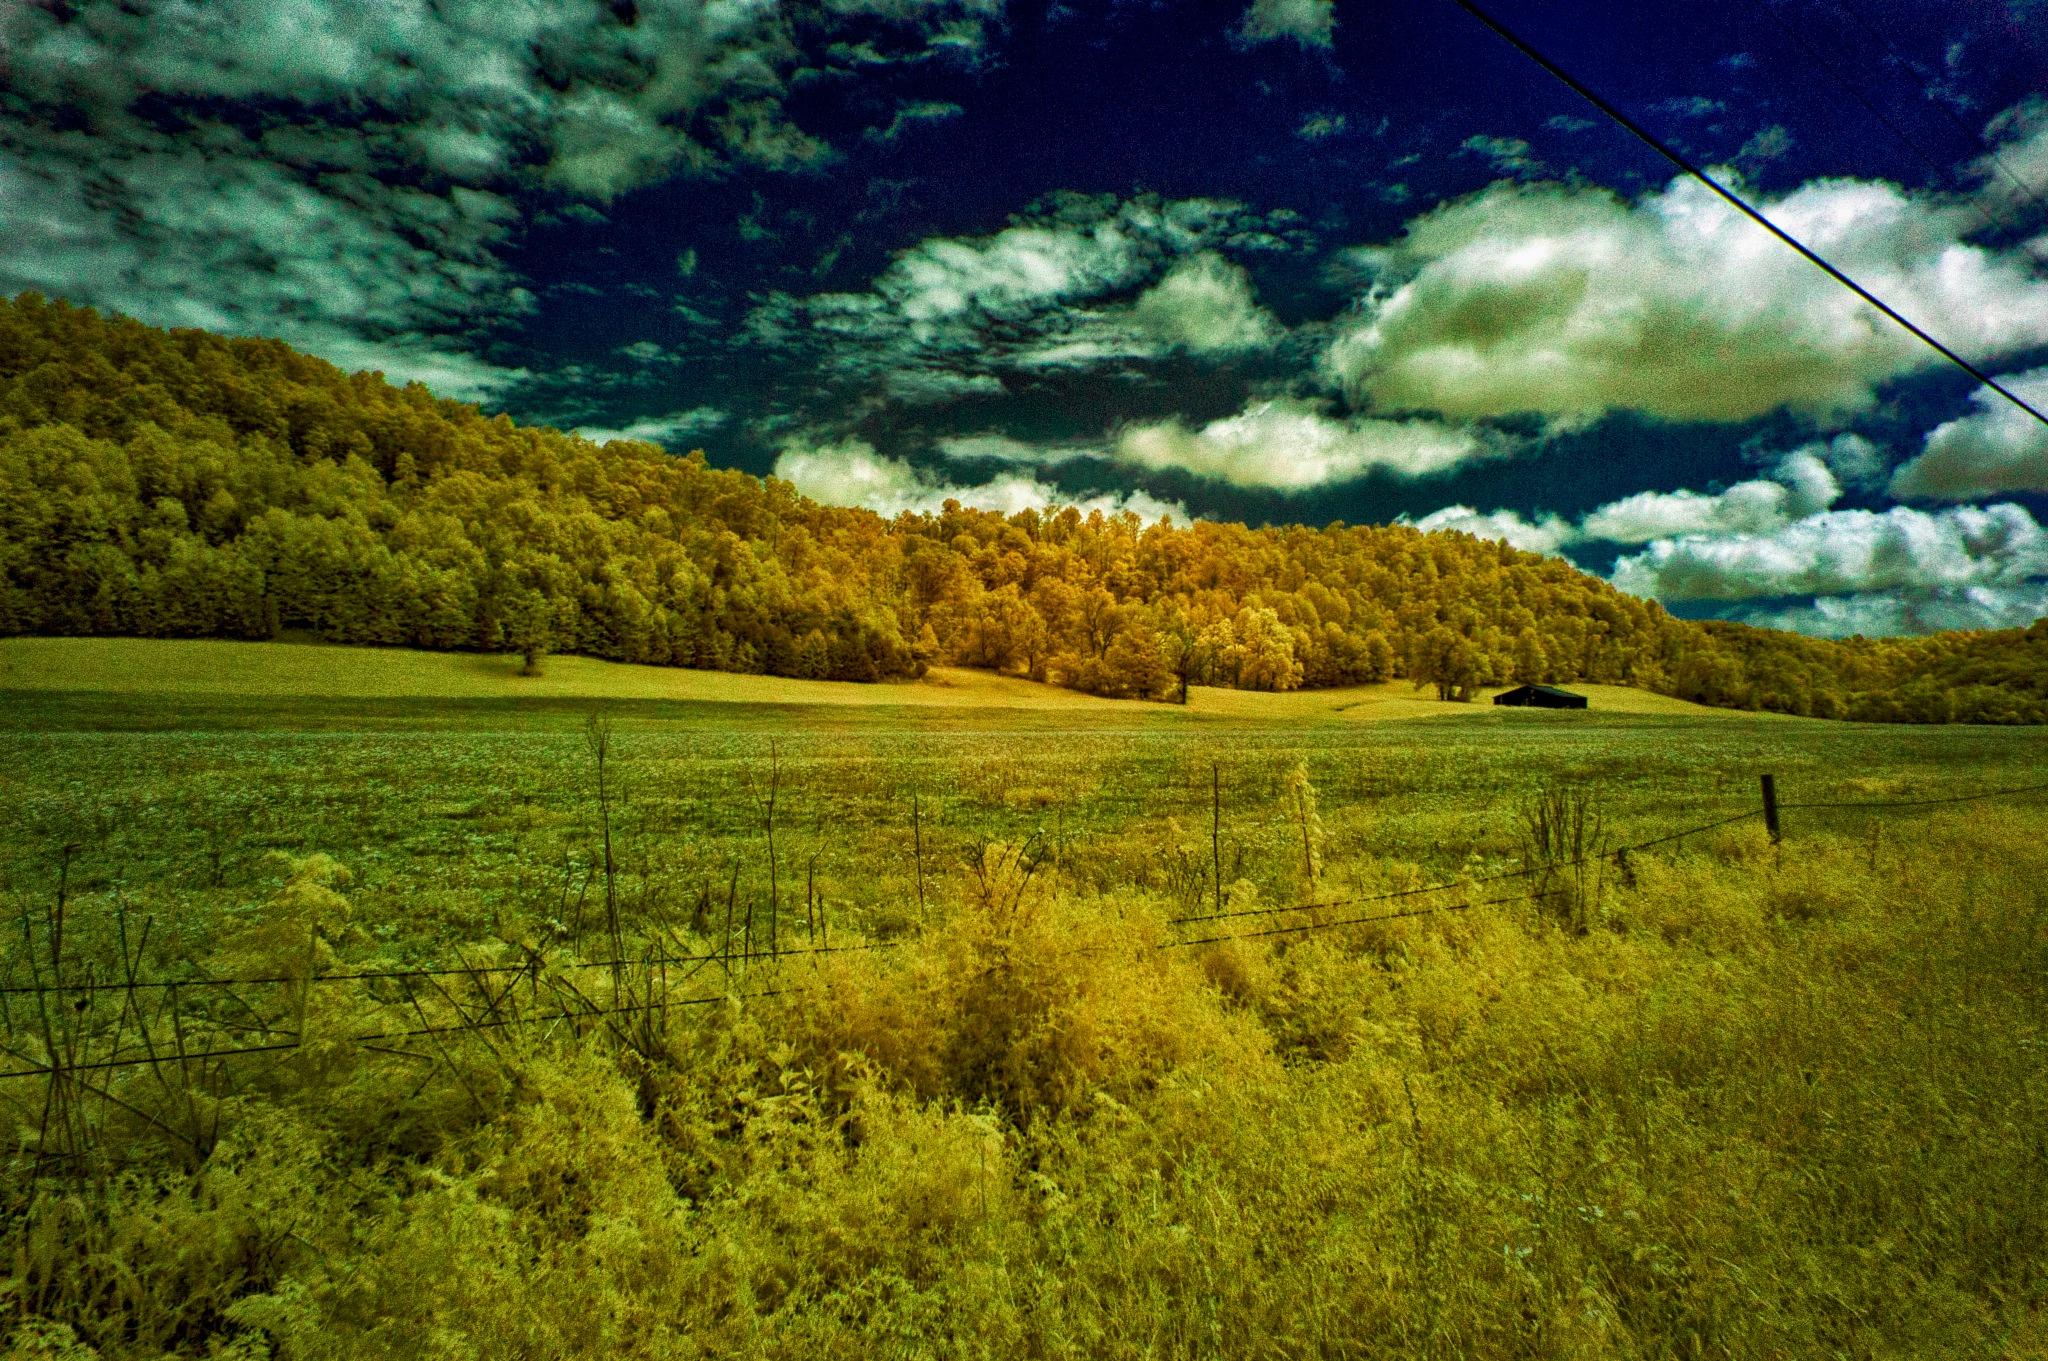 Infrared Landscape by Dean Francisco